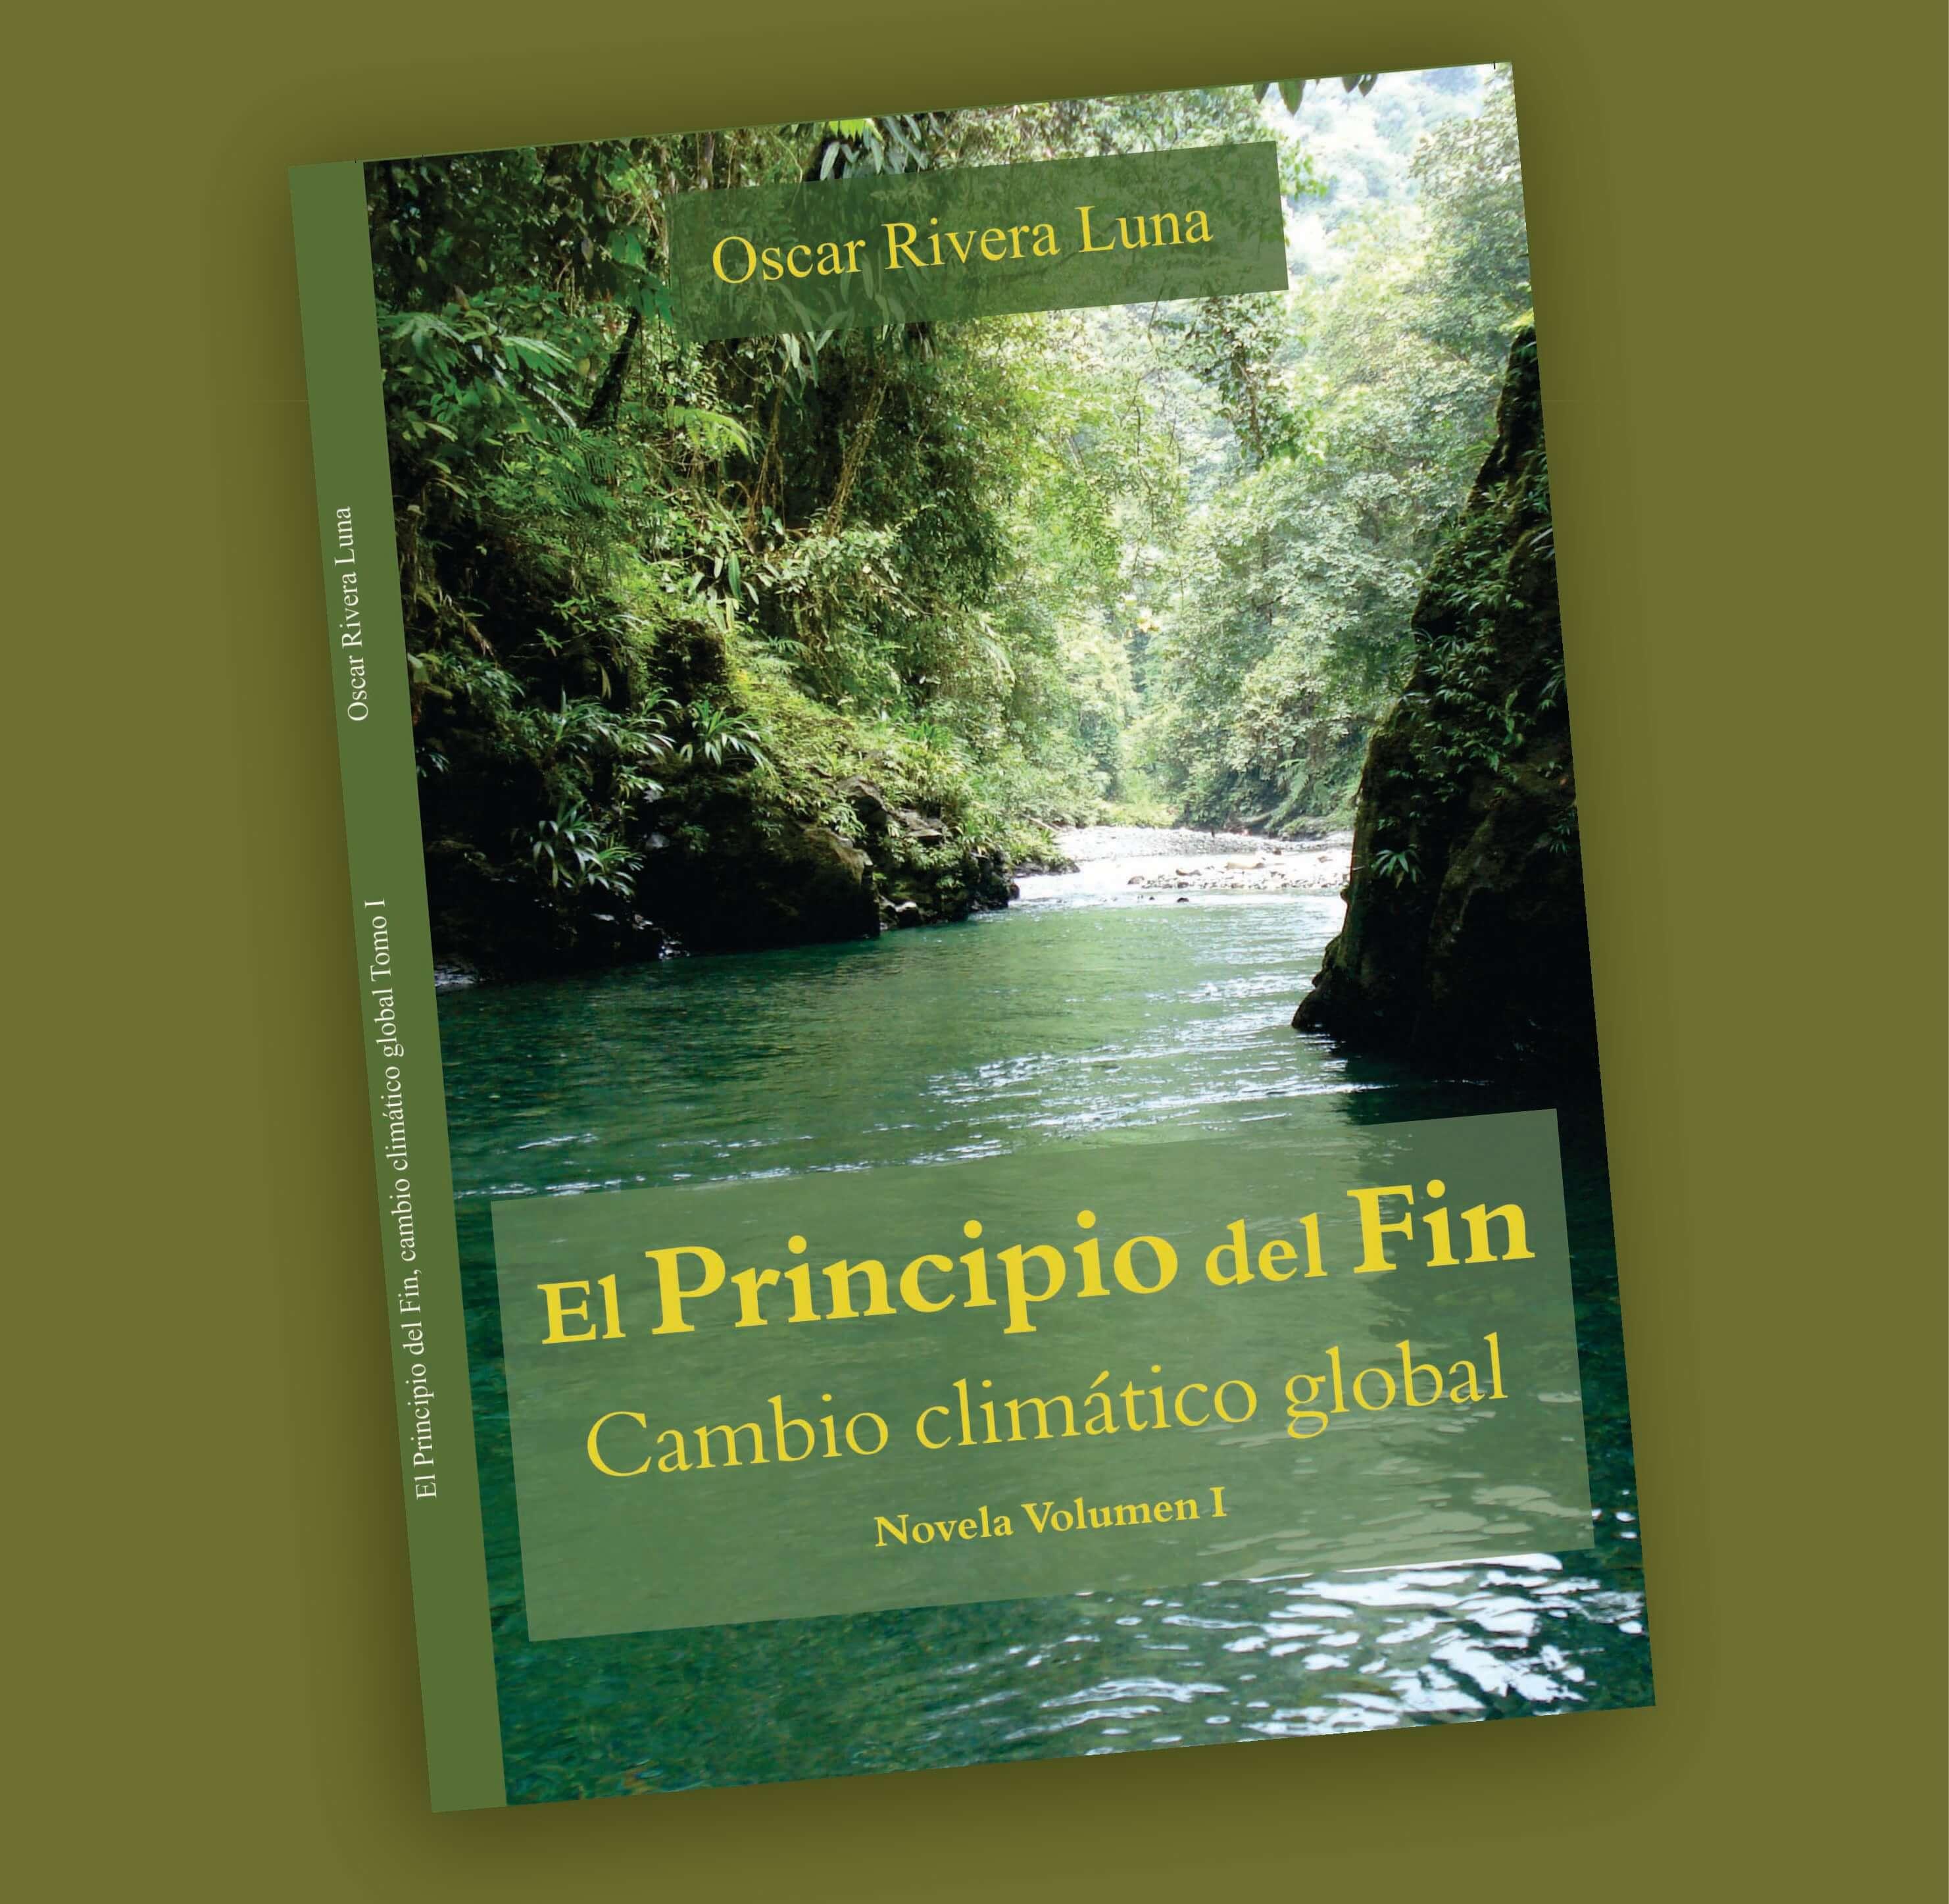 El Principio del fina-Oscar Rivera Luna